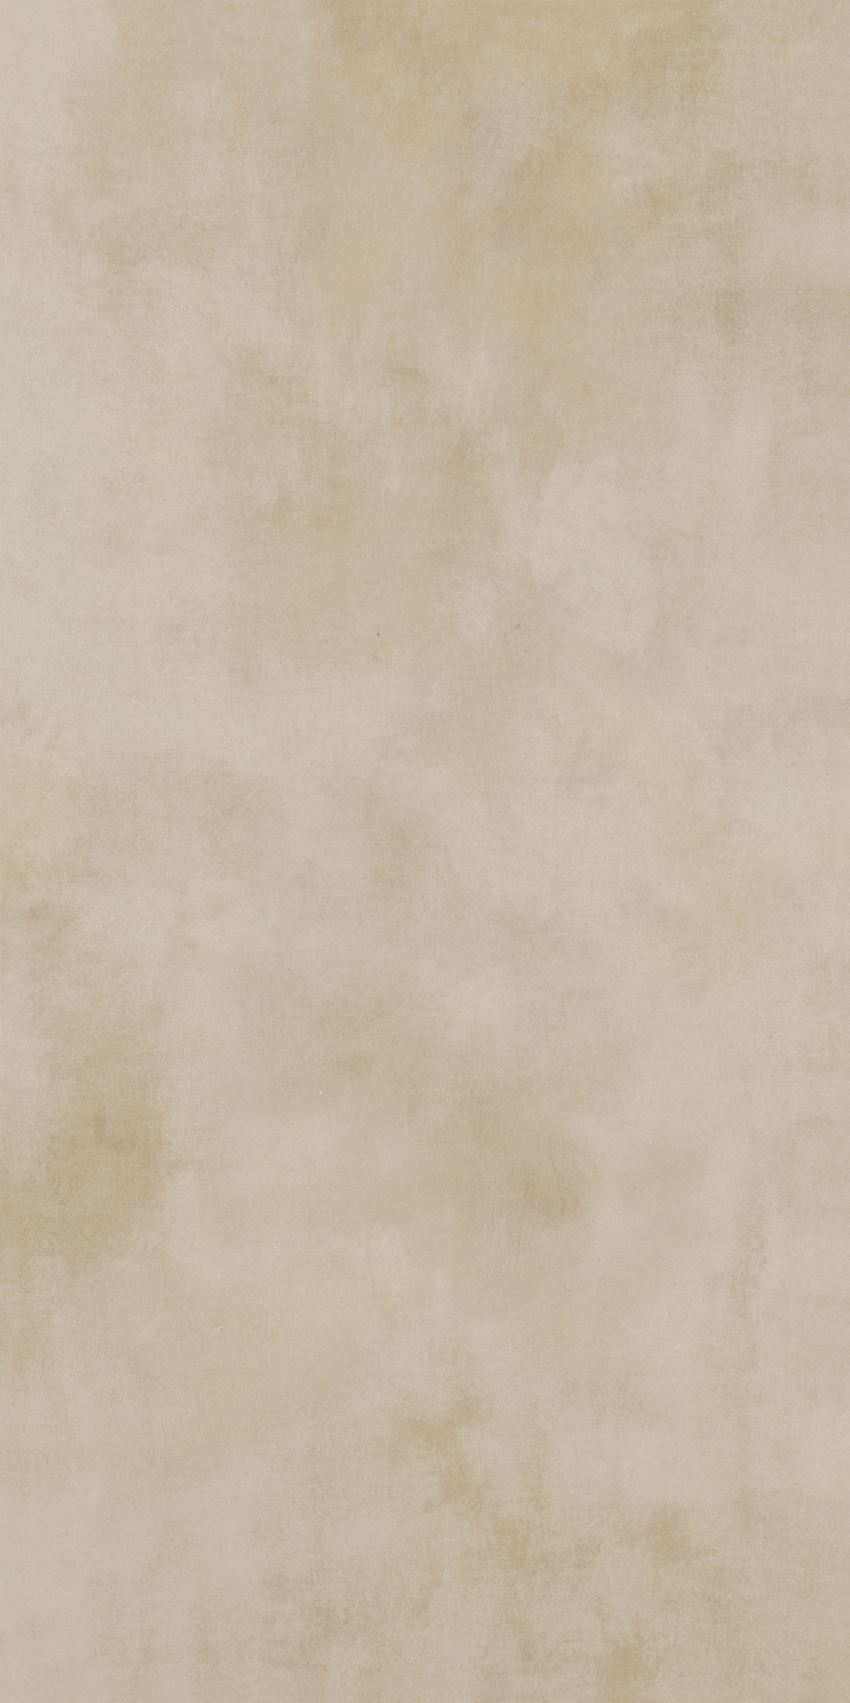 Płytka uniwersalna 44,8x89,8 cm Paradyż Tecniq Beige Gres Szkl. Rekt. Mat.